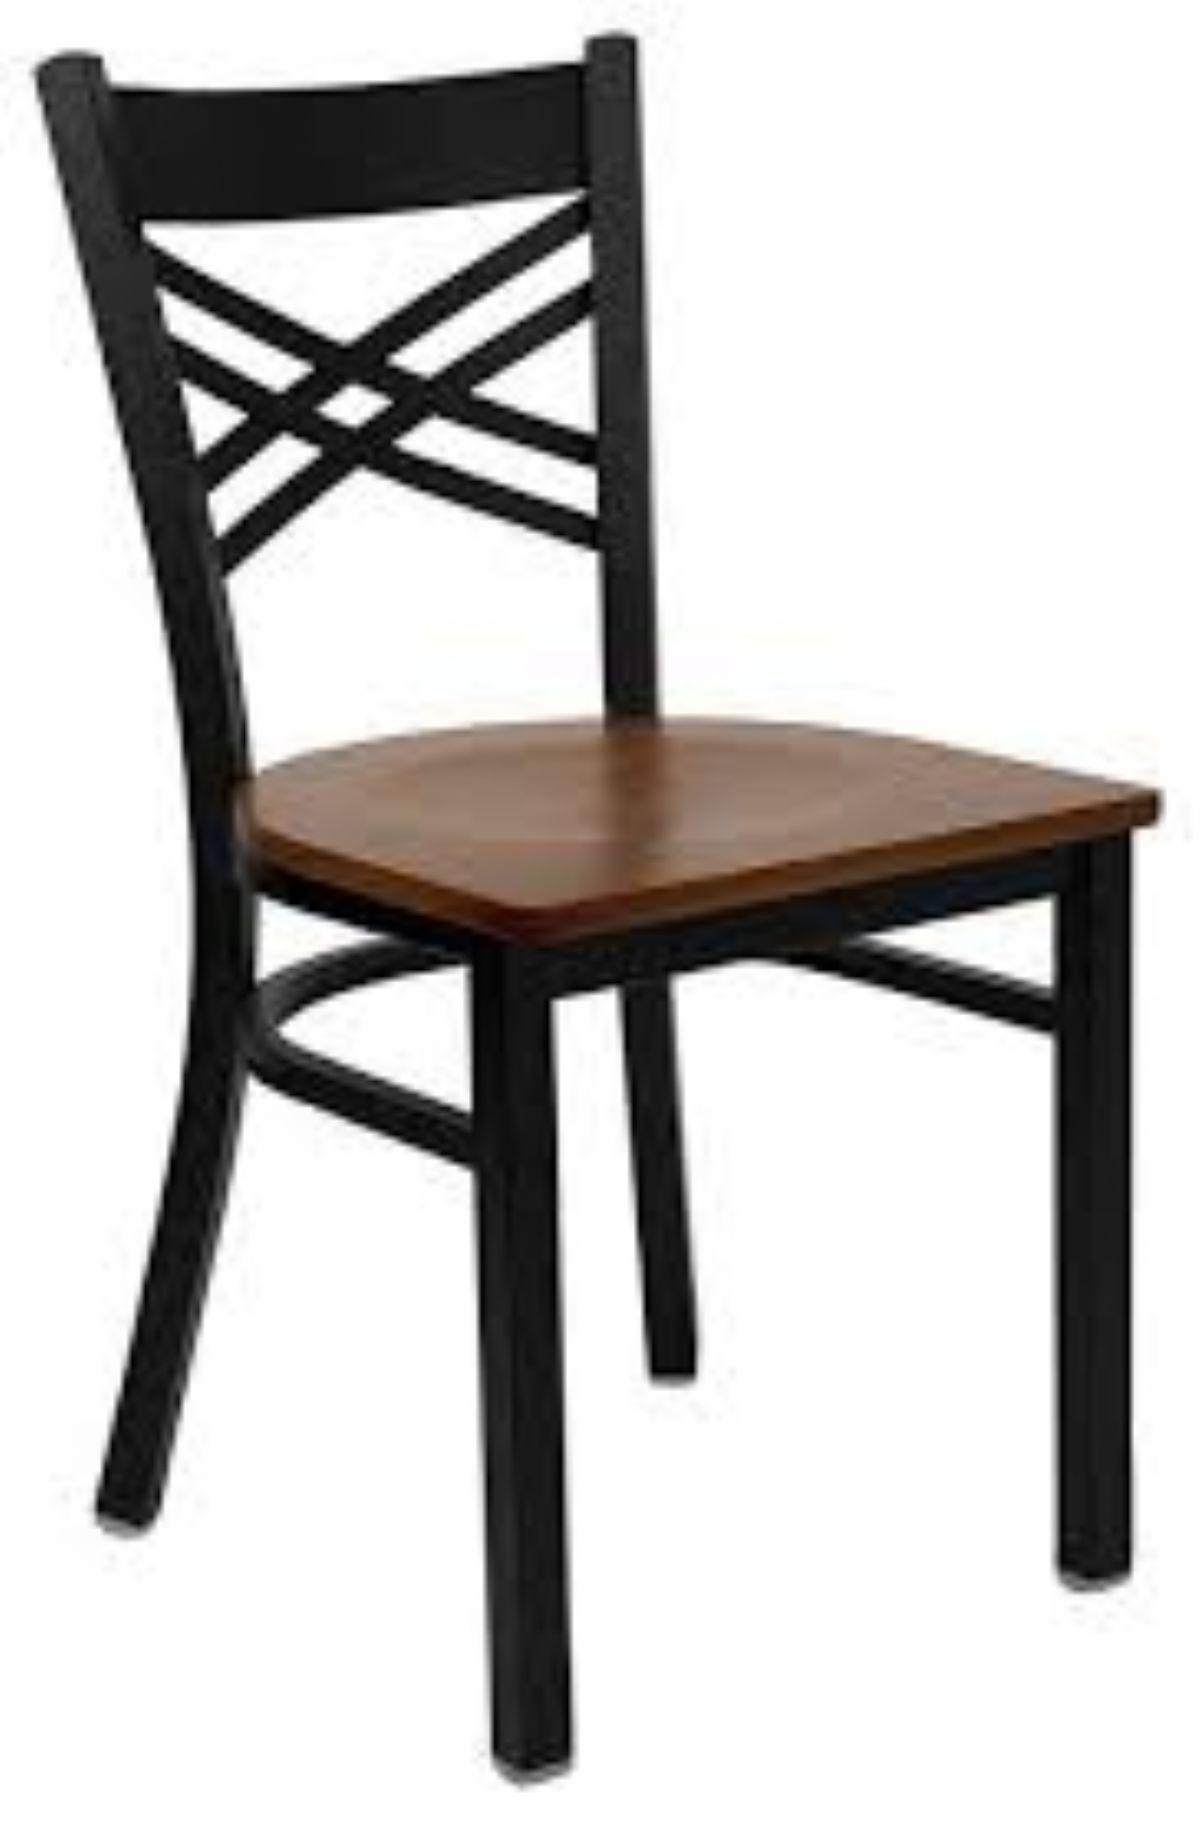 Dream Meaning of Chair - Dream Interpretation